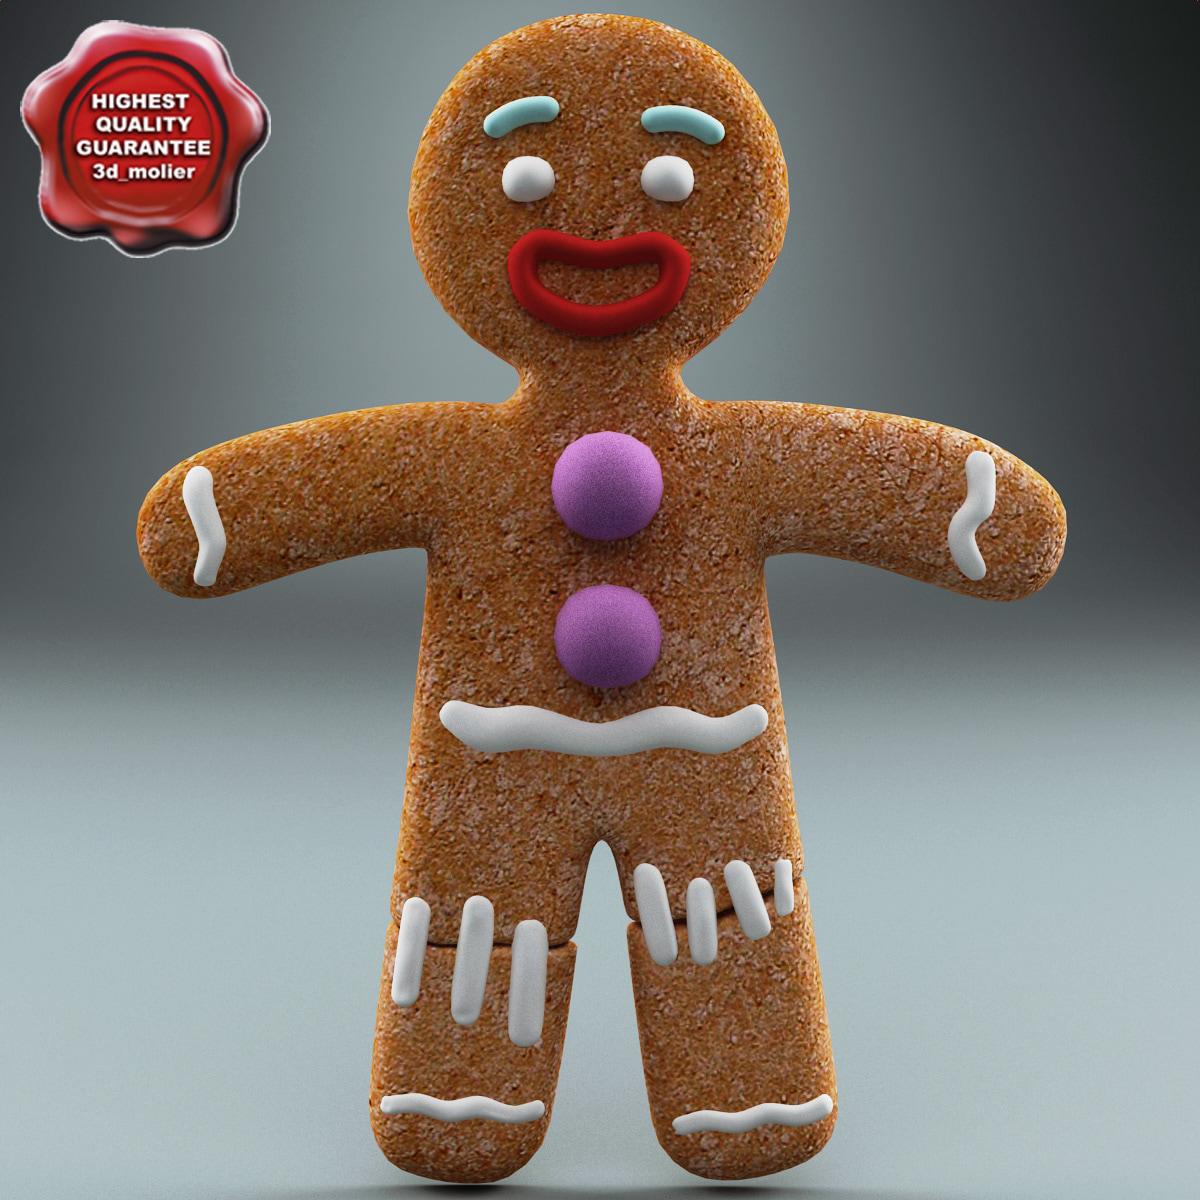 Gingerbread_Man_Static_00.jpg